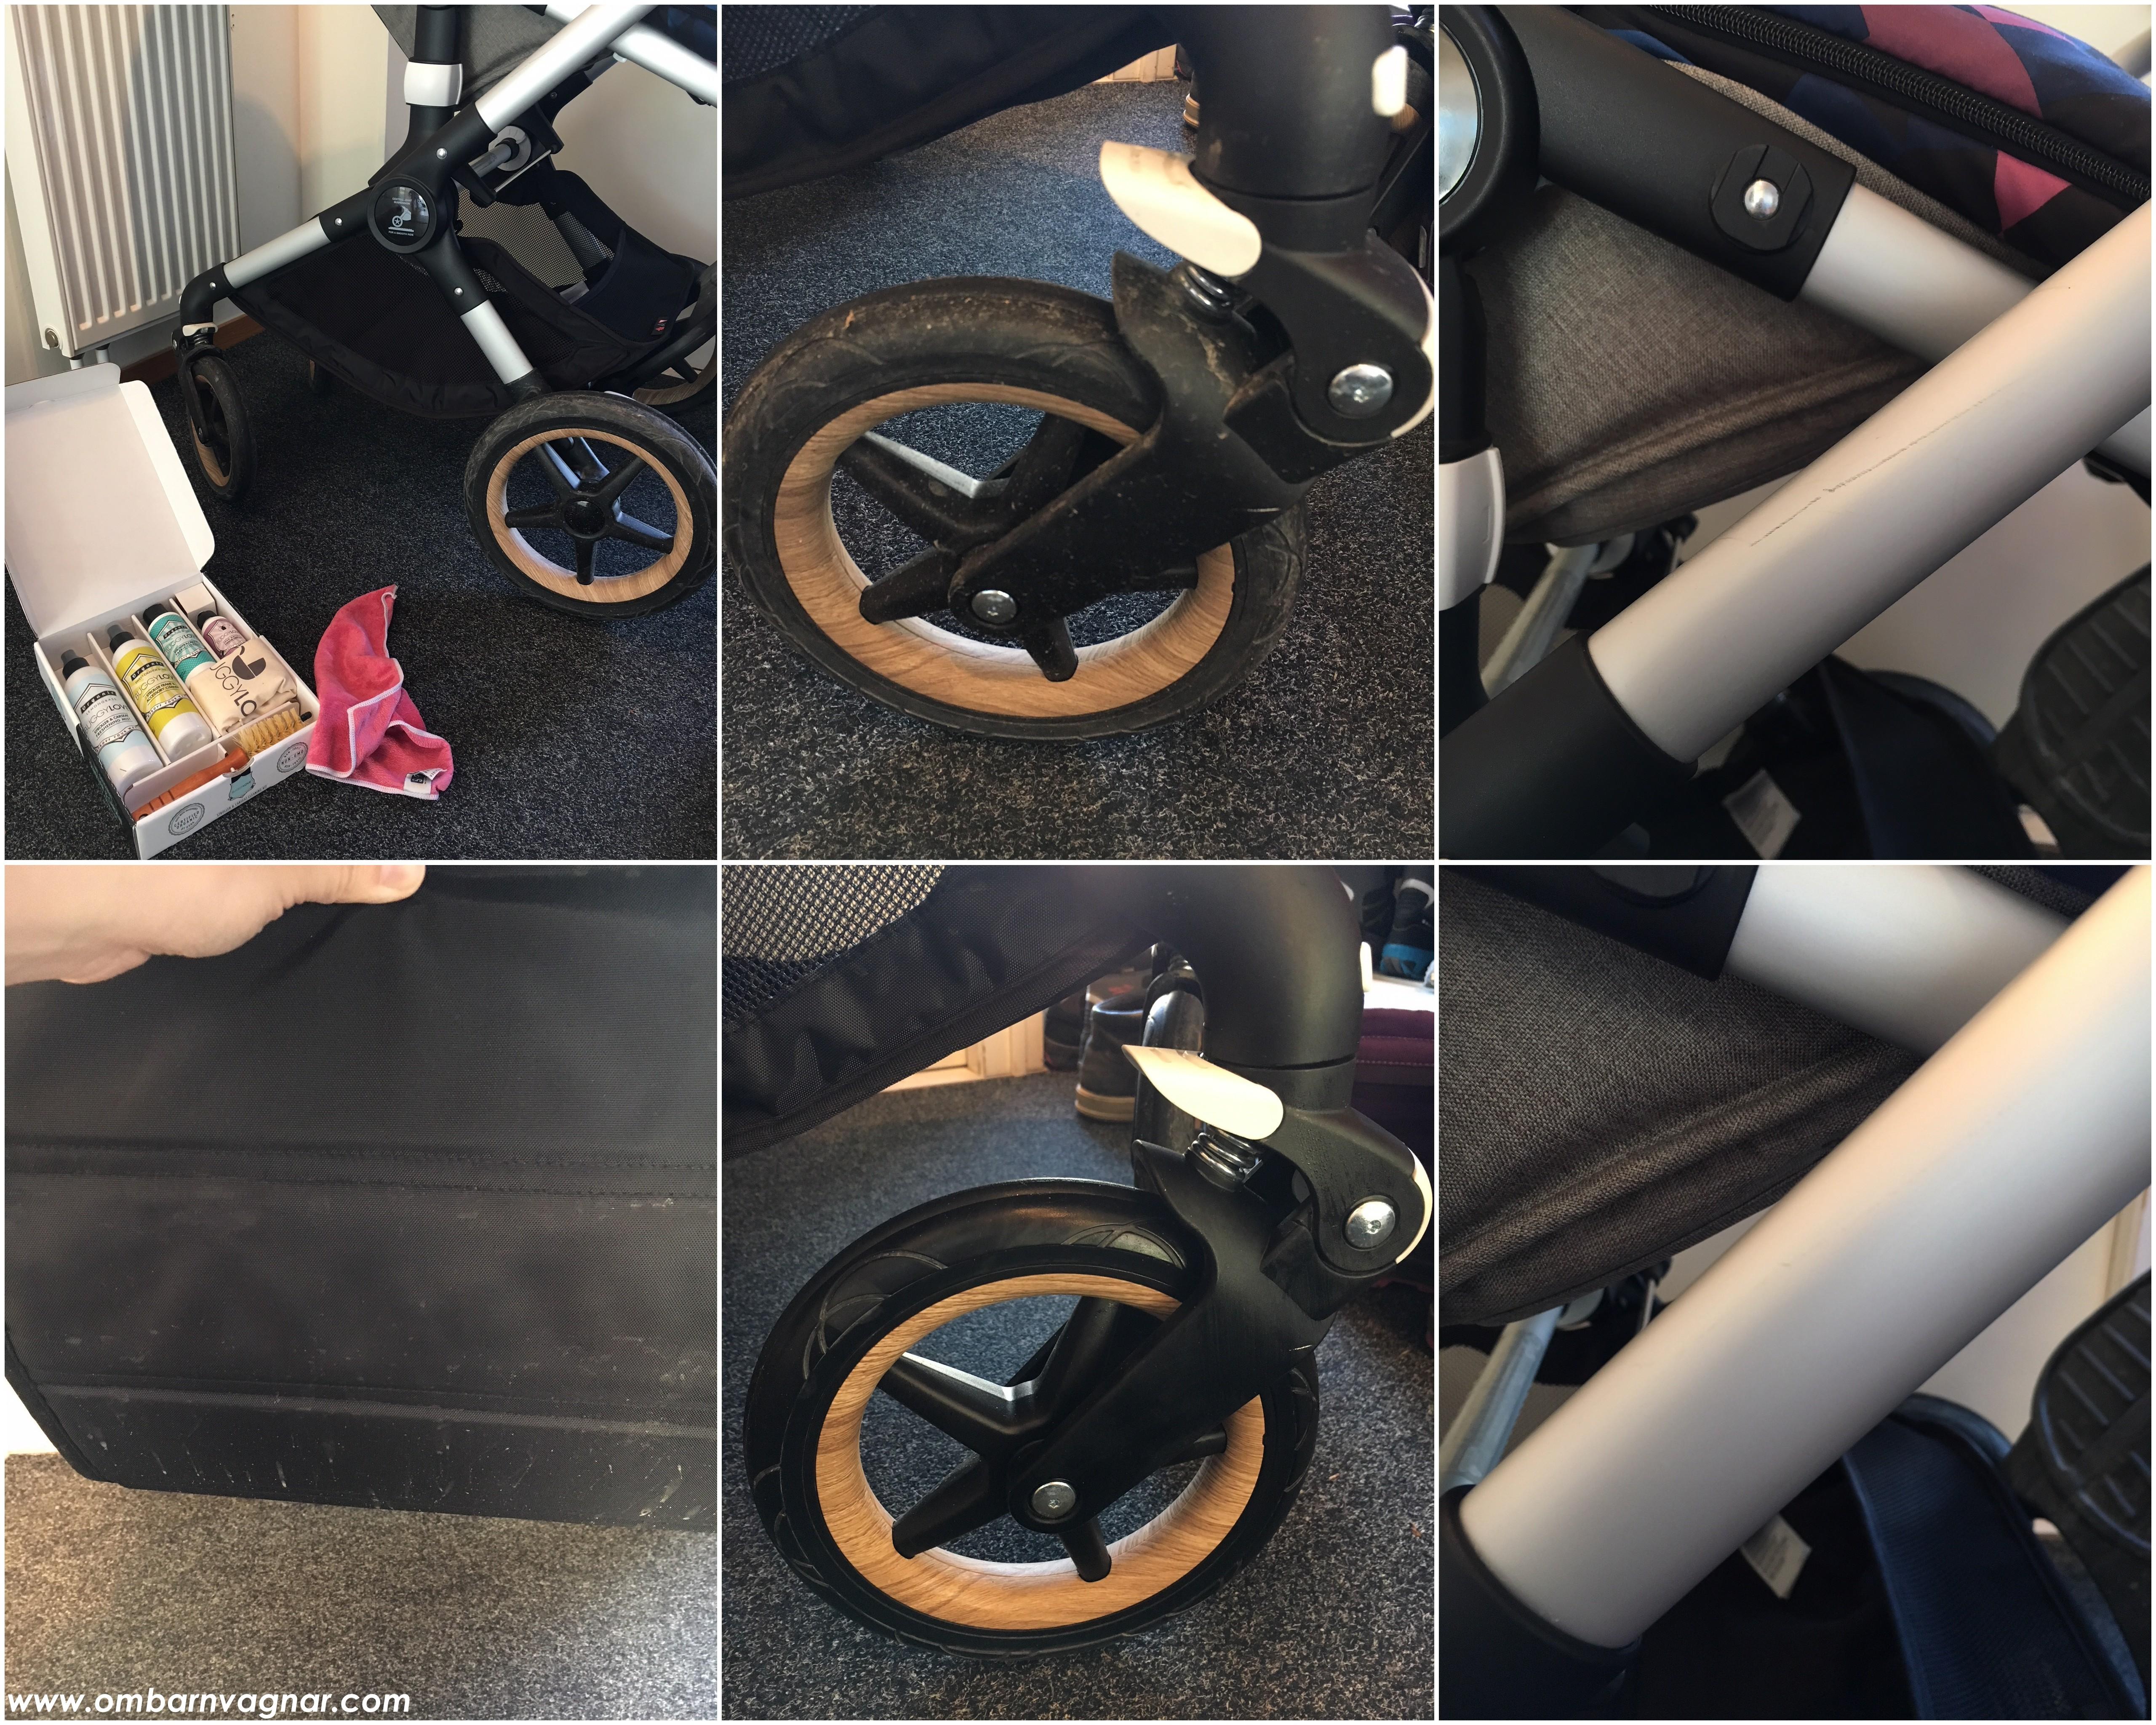 Rengöra barnvagnen med ekologiska rengöringsmedel